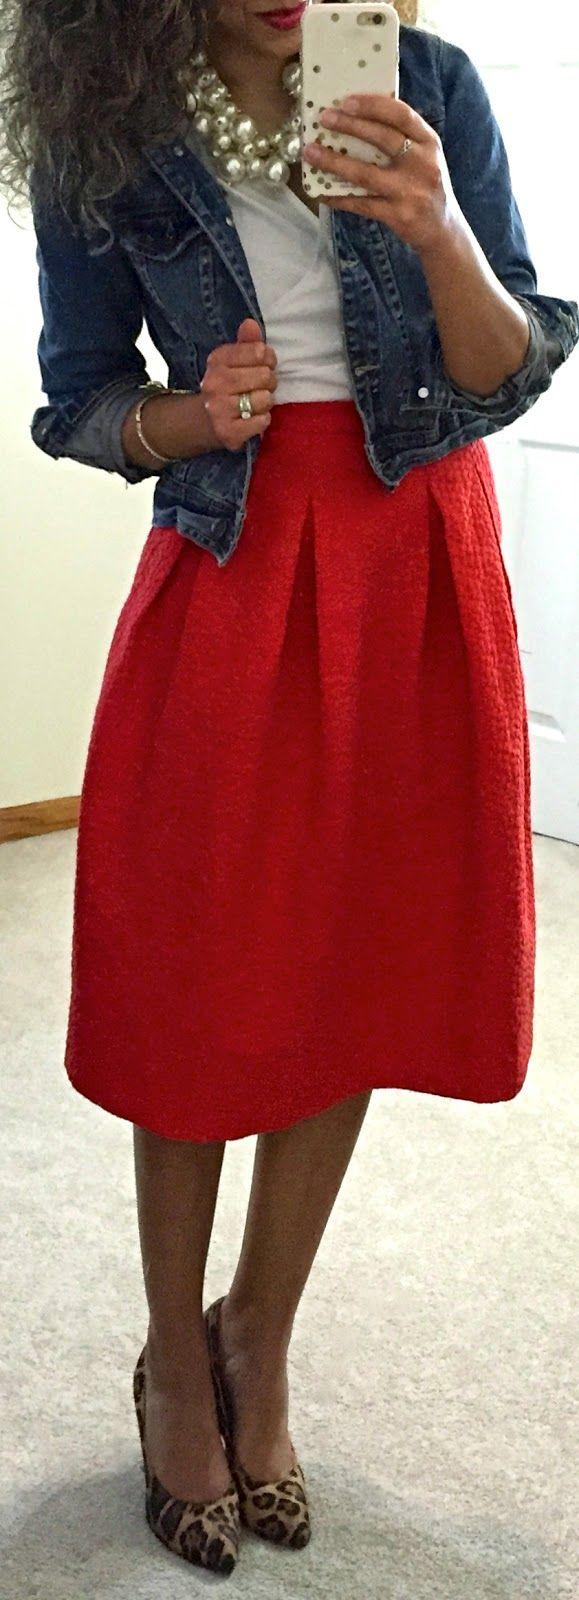 Red midi skirt, denim jacket, & pearls.